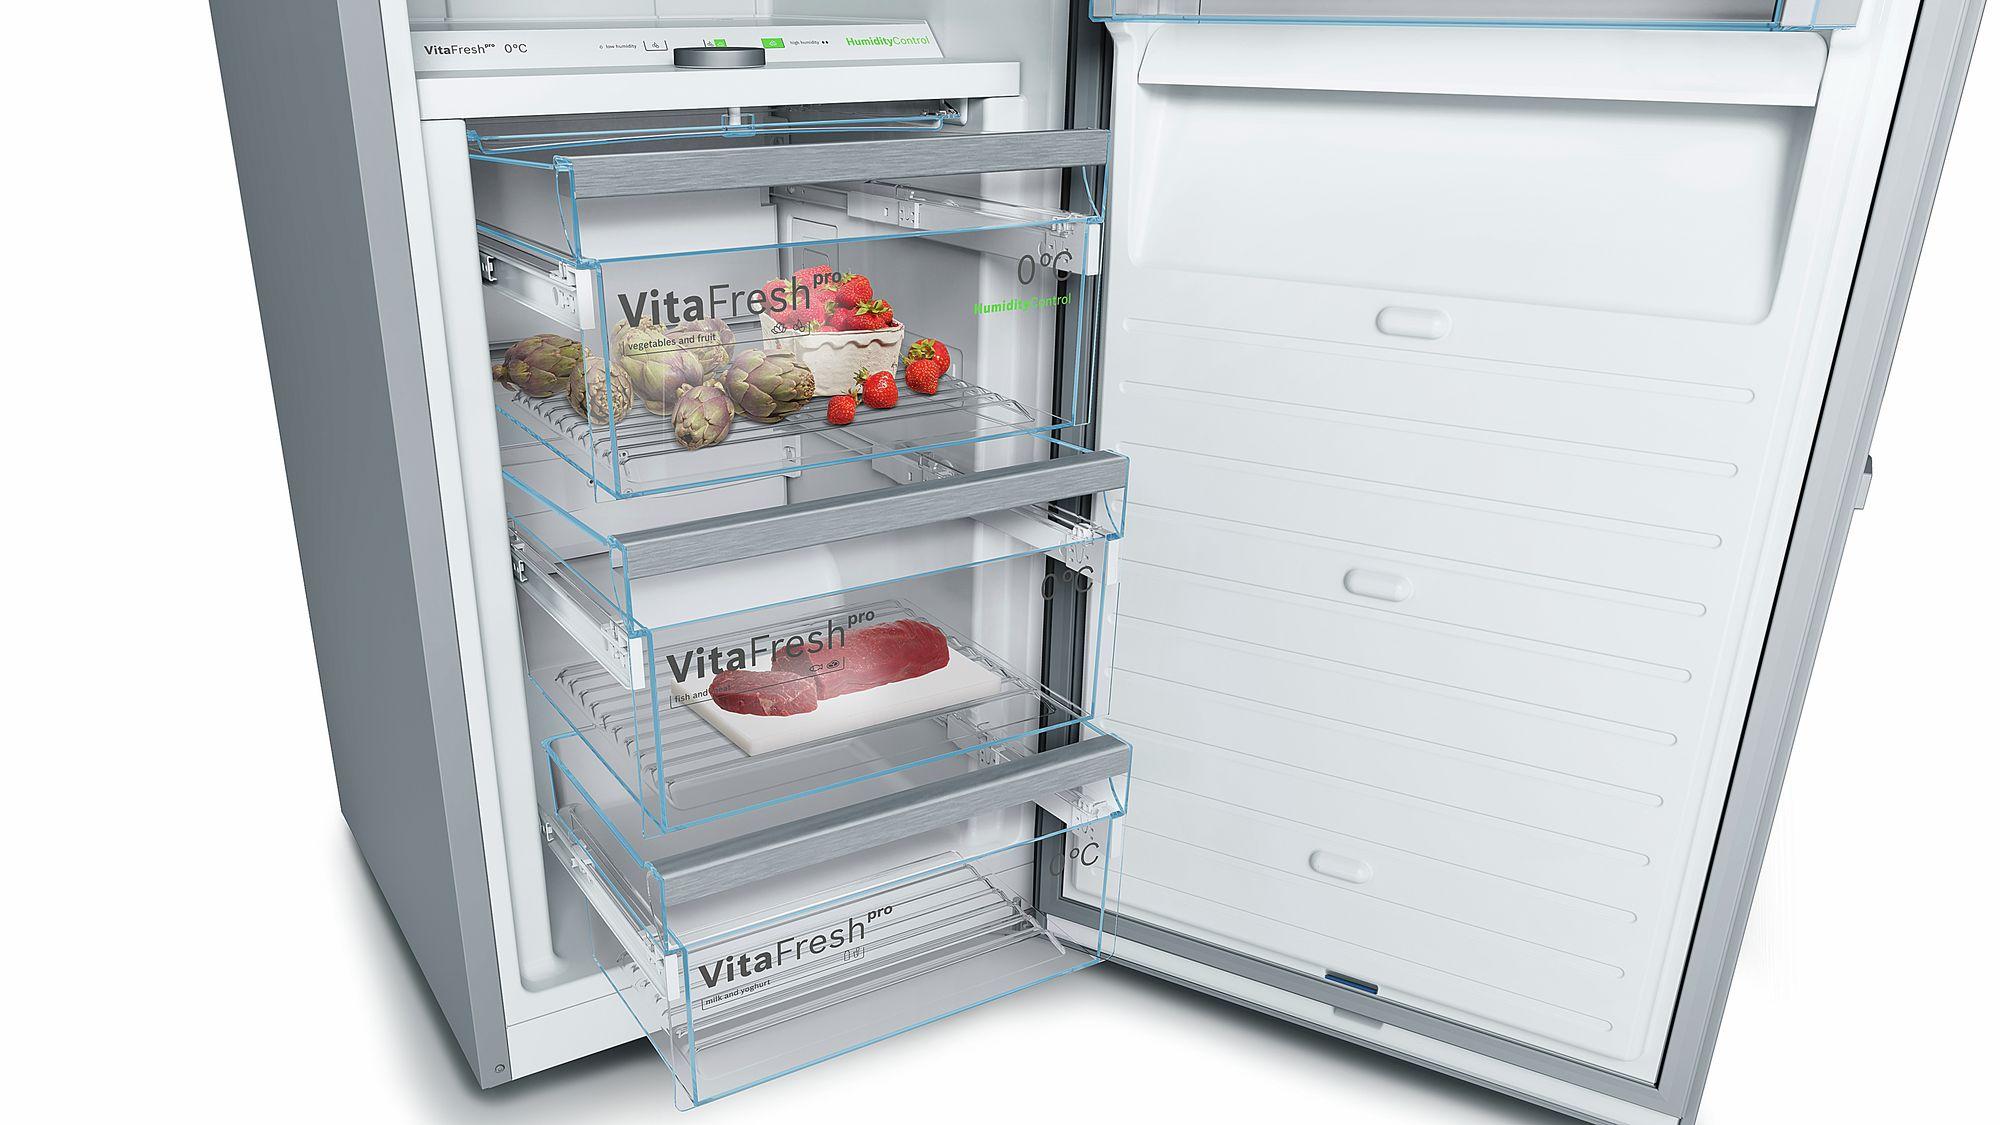 Kühlschrank Bosch : Bosch stand kühlschrank türen edelstahl mit anti fingerprint